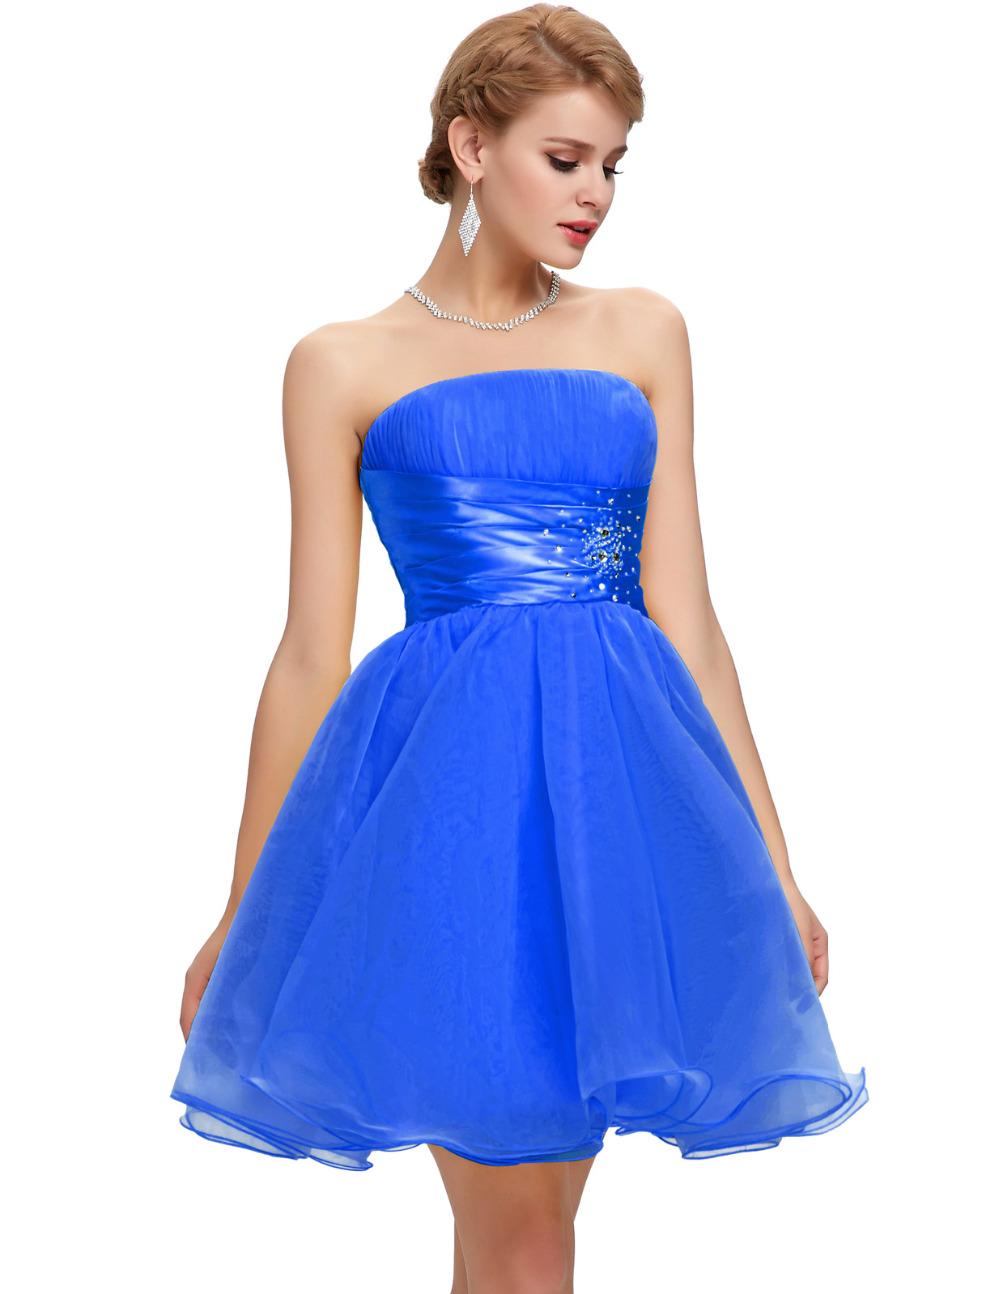 Sequin Cocktail Dresses Under 50 - Ocodea.com